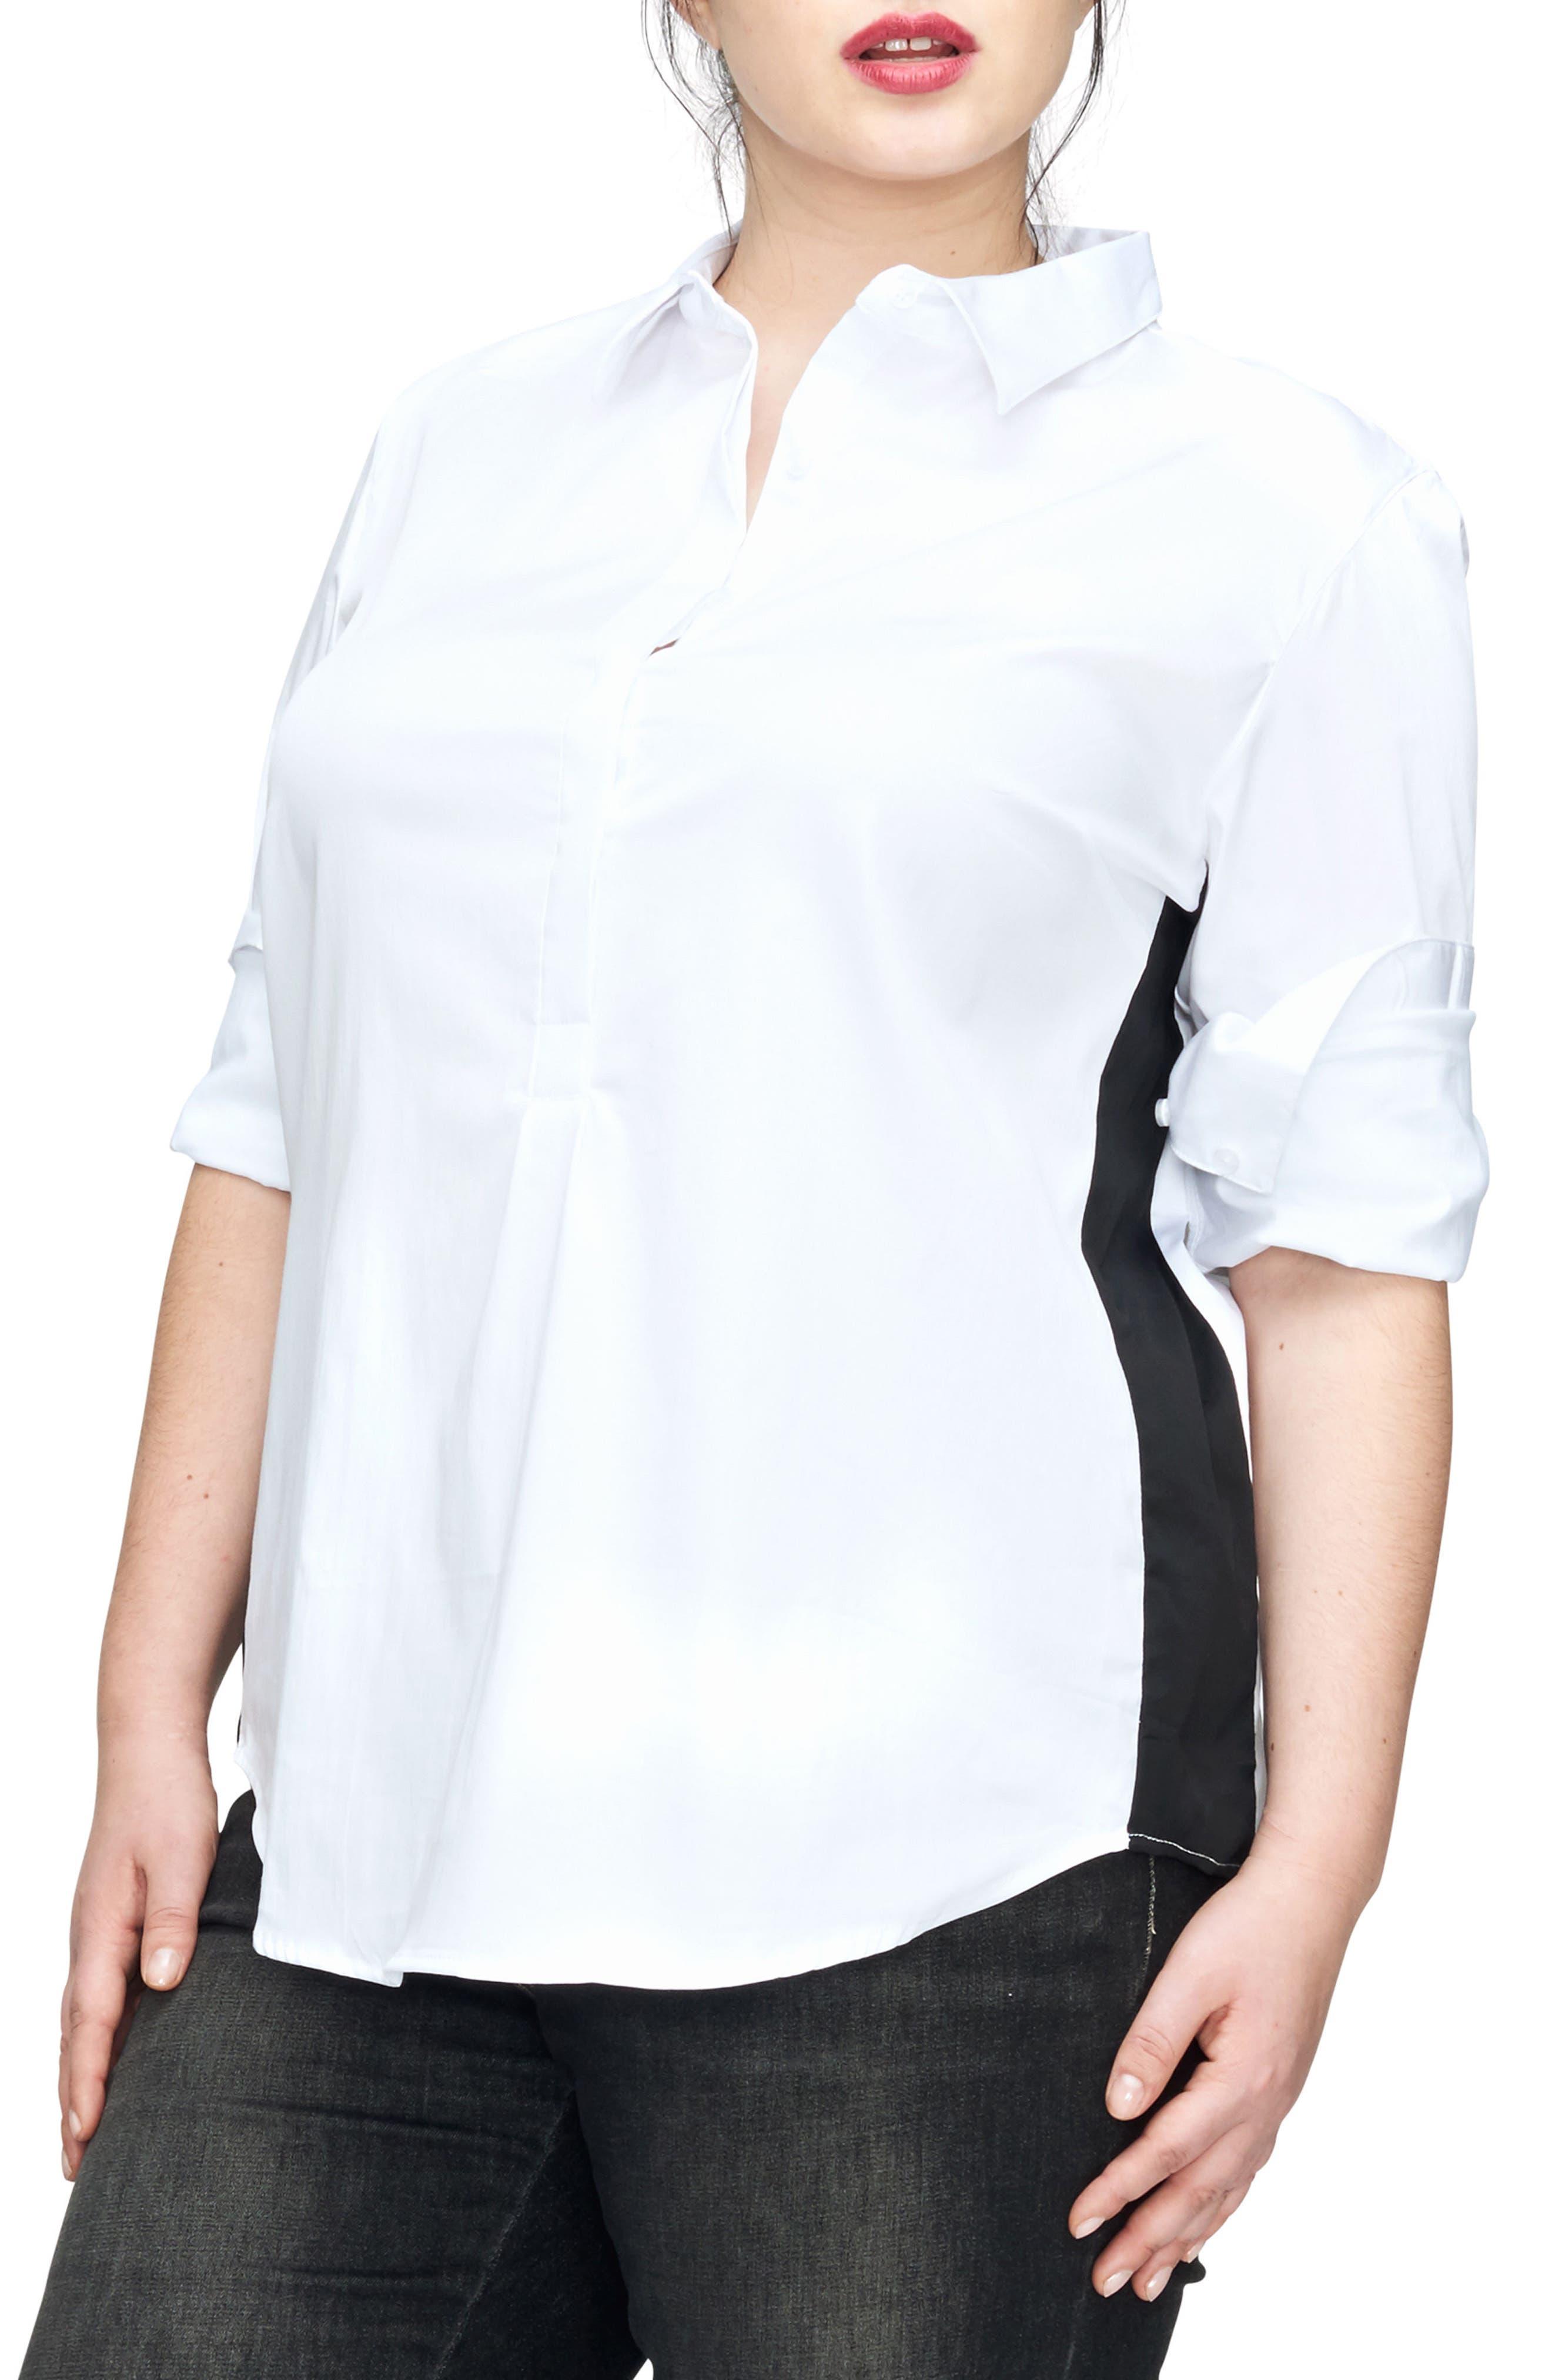 Ebro Colorblock Shirt,                         Main,                         color, 101